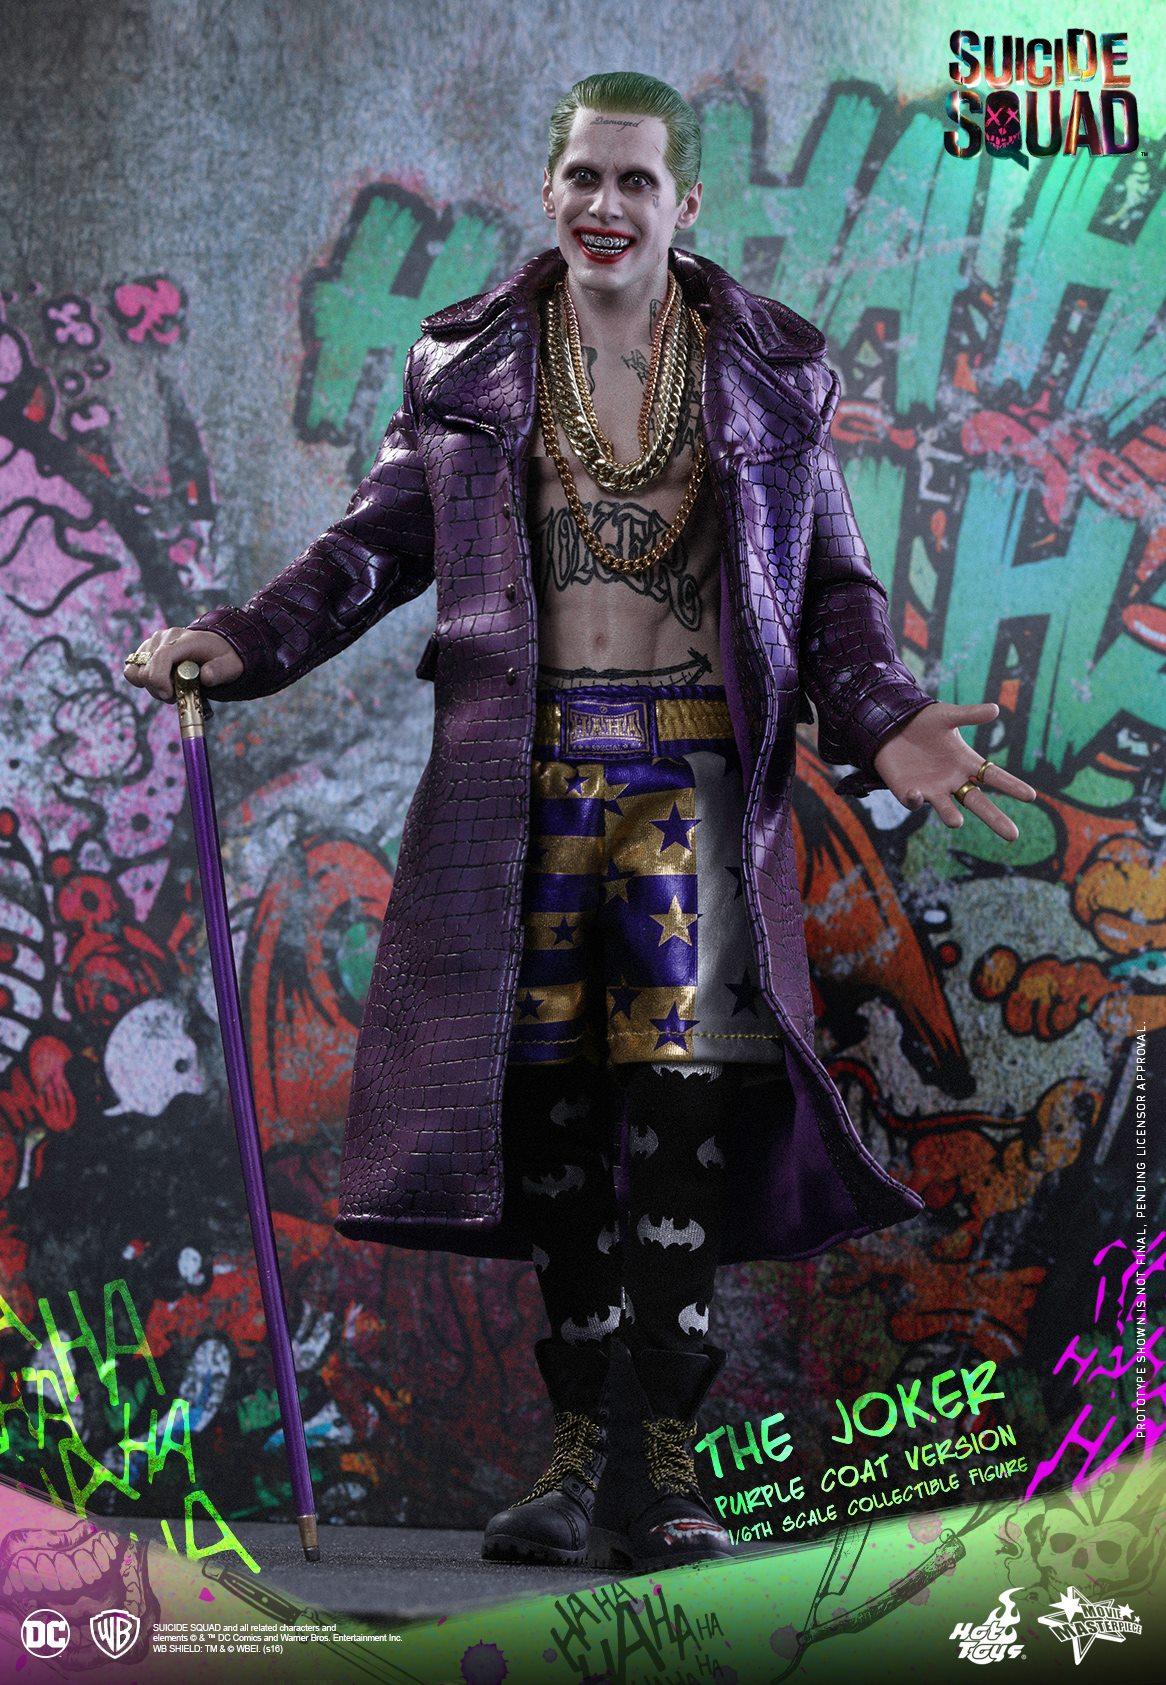 Hot-Toys-Suicide-Squad-Joker-Purple-Coat-14